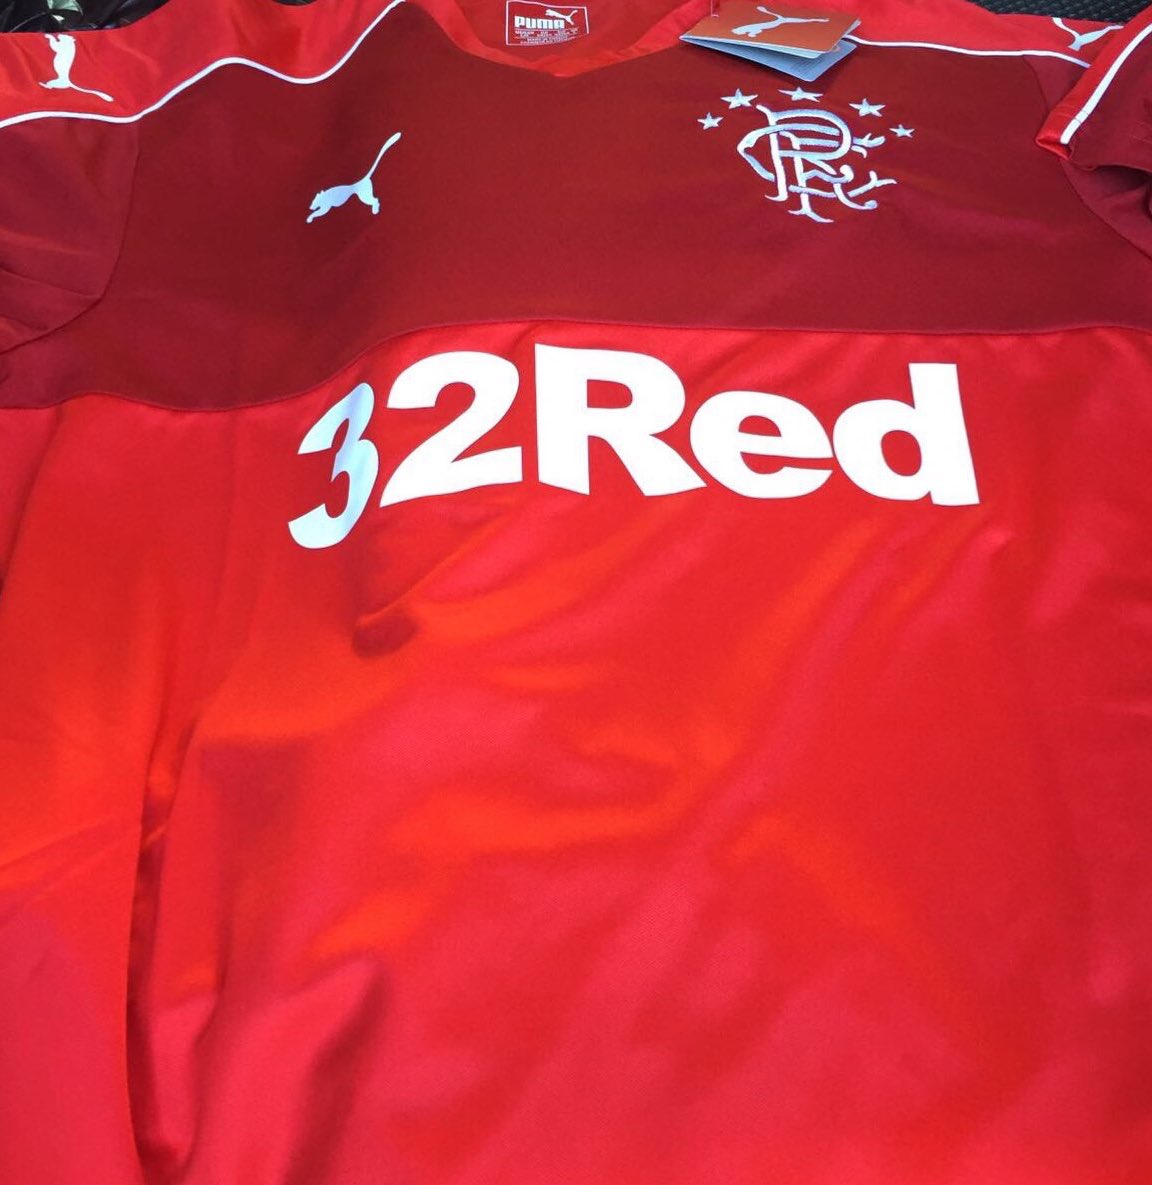 440f44352 Rangers Away Kit Related Keywords   Suggestions - Rangers Away Kit ...